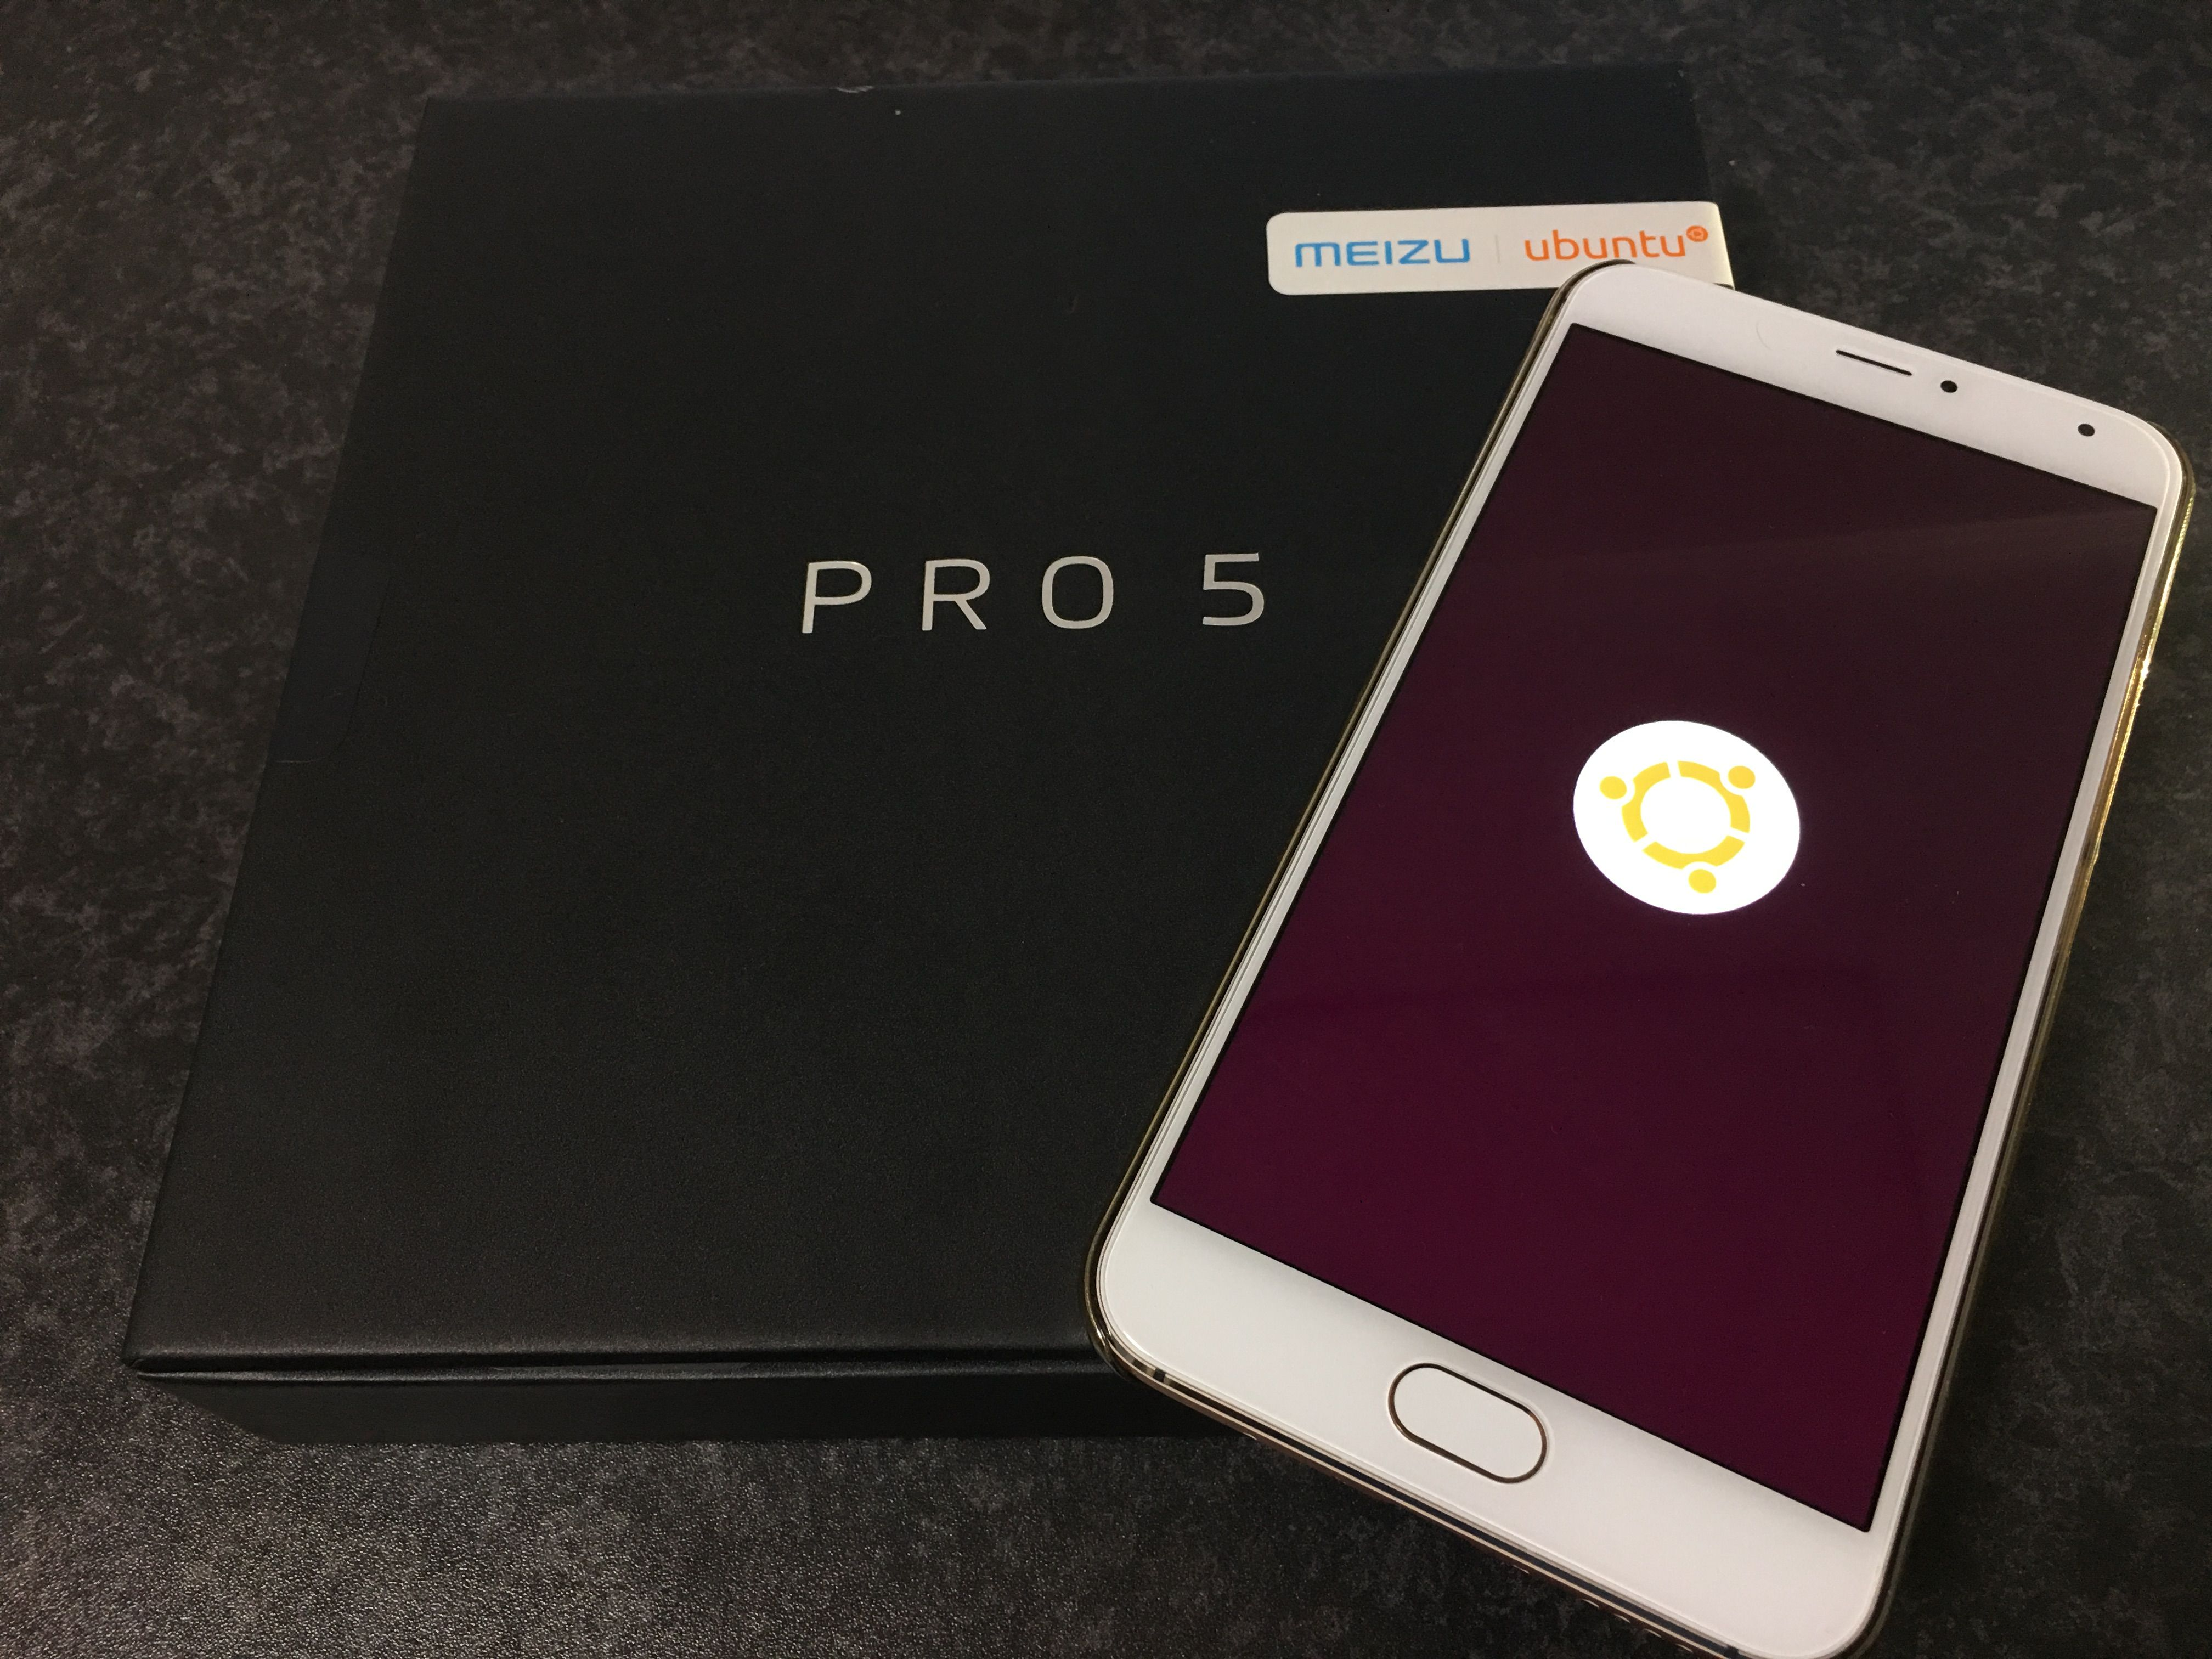 Ubuntu PhoneのコードネームにMidoriがあるらしい。Meizuの新製品ではないかという噂。